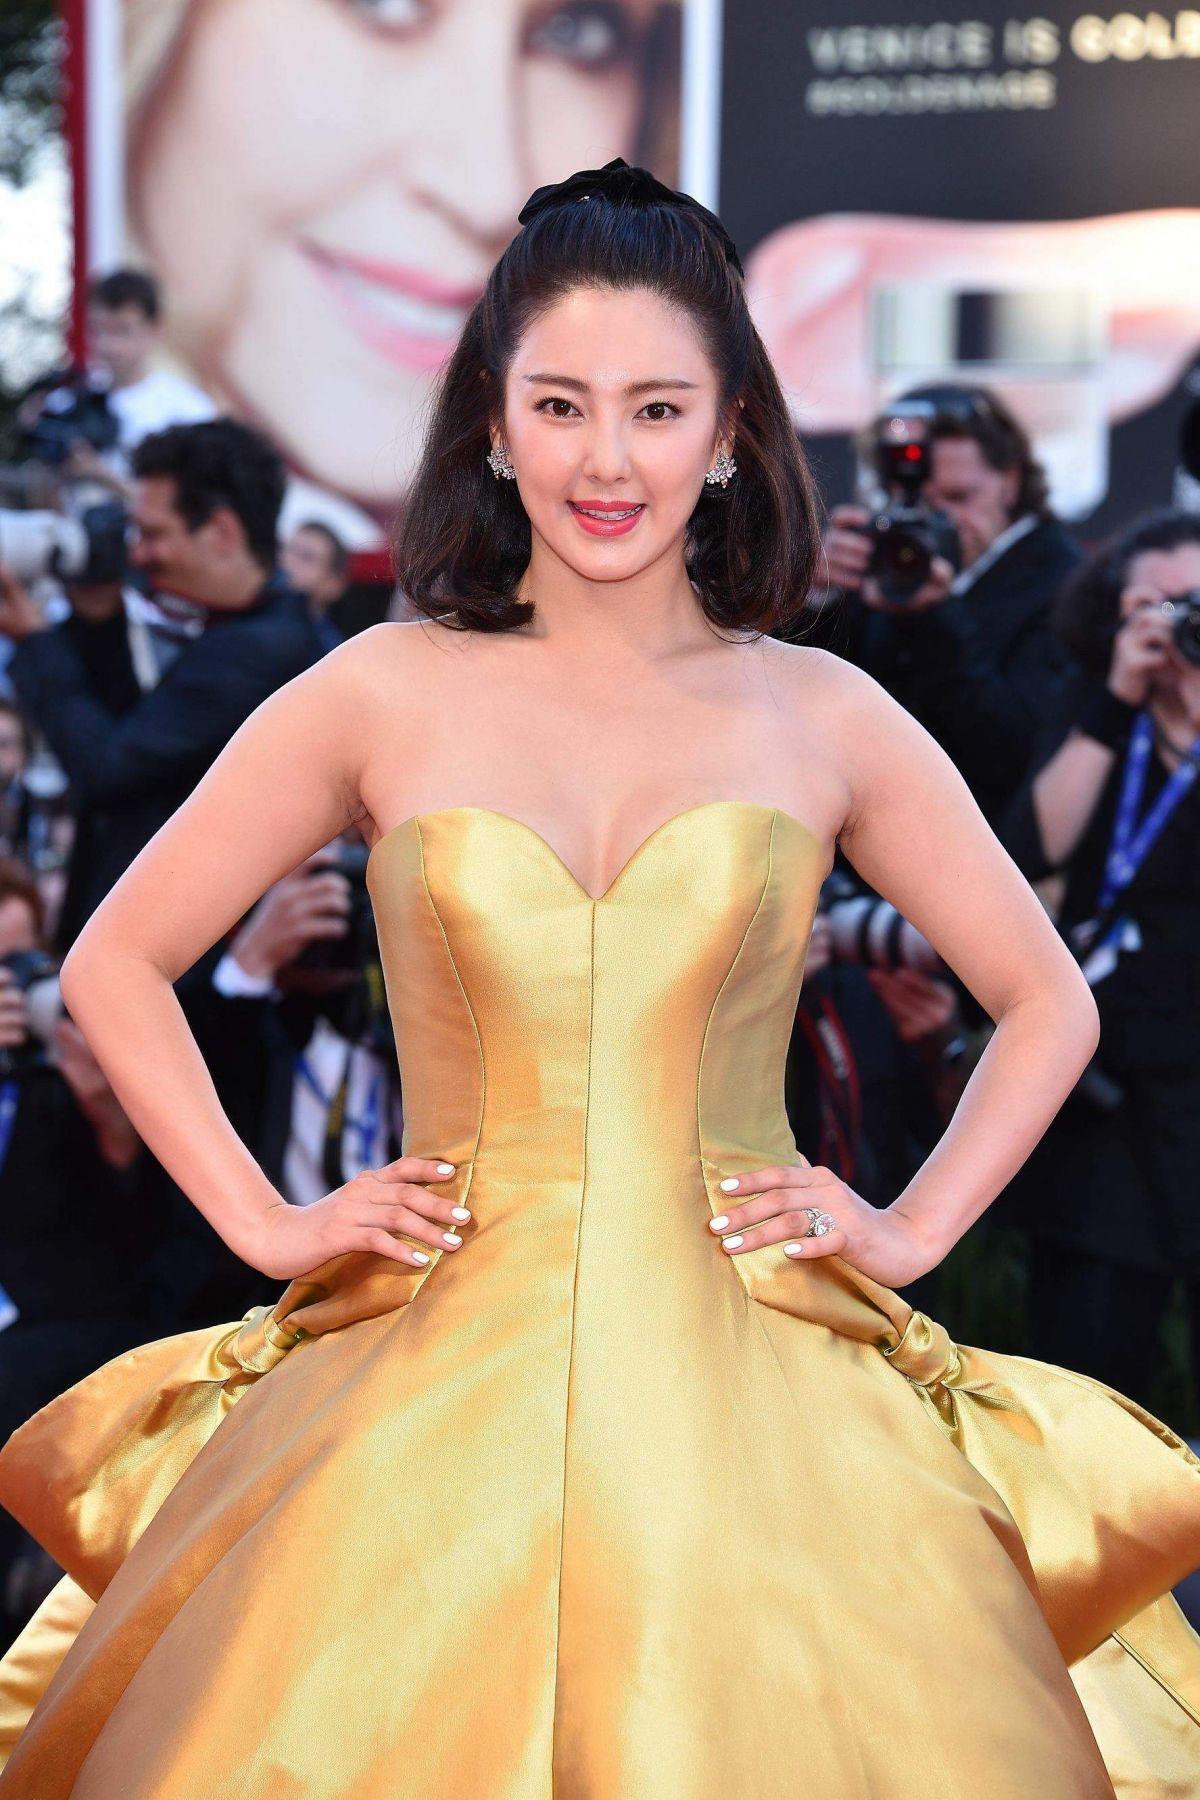 ZHANG YUQI at 'La La Land' Premiere at 2016 Venice Film Festival 08/31/2016